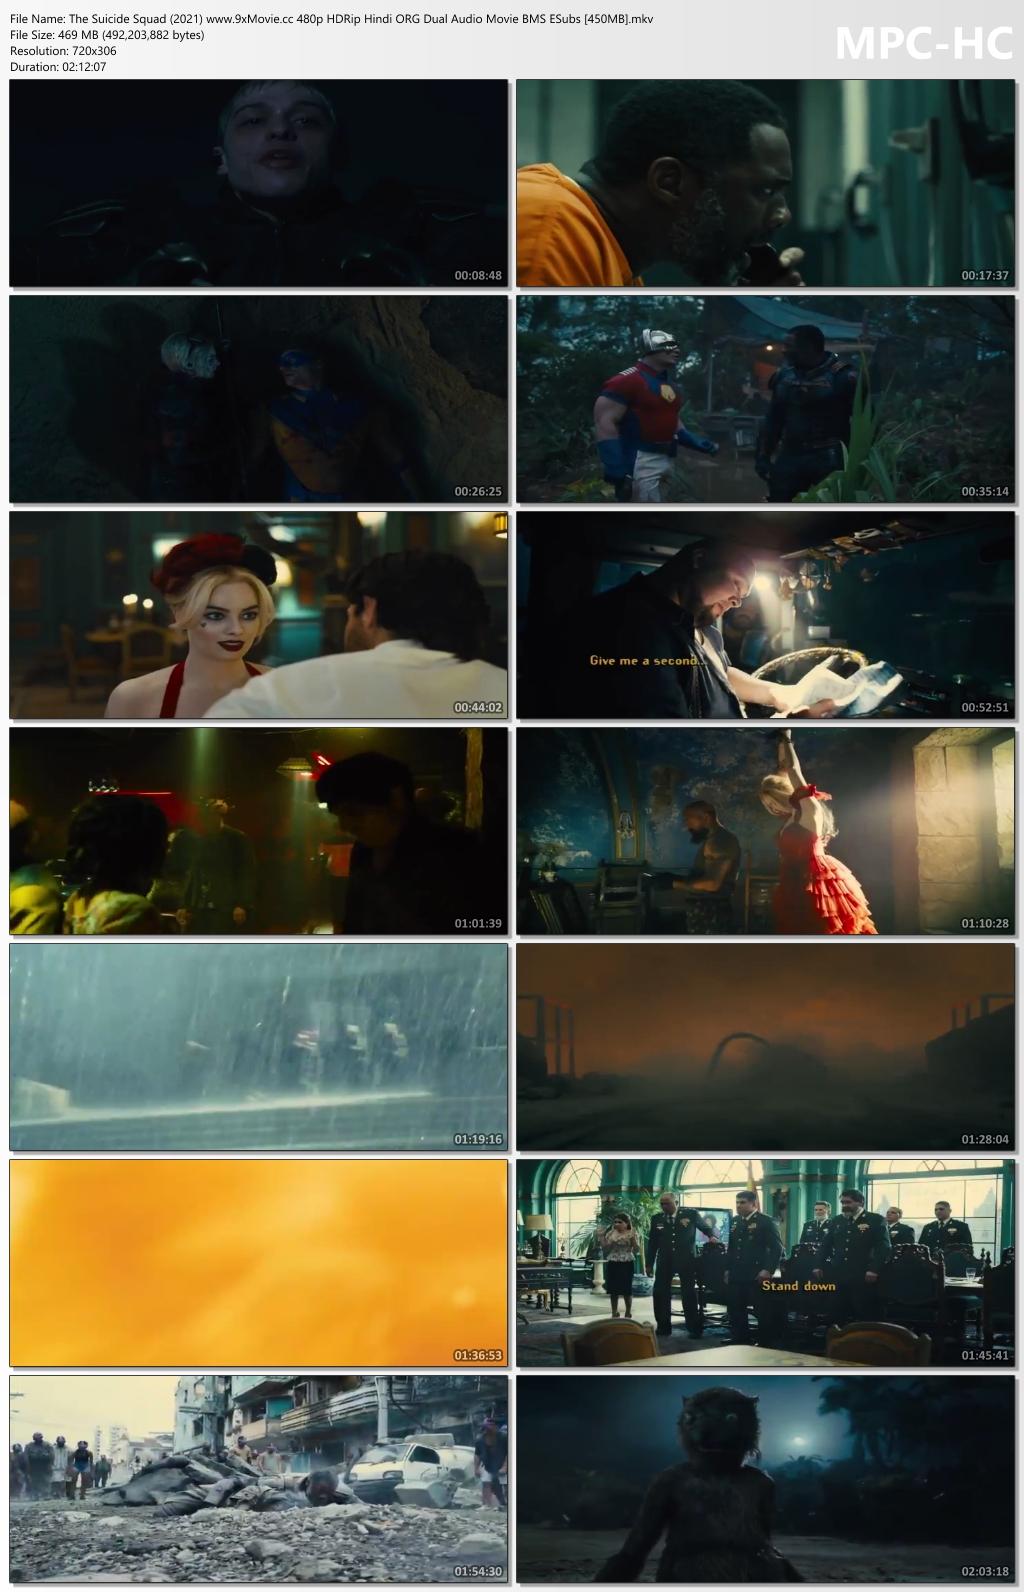 The-Suicide-Squad-2021-www-9x-Movie-cc-480p-HDRip-Hindi-ORG-Dual-Audio-Movie-BMS-ESubs-450-MB-mkv